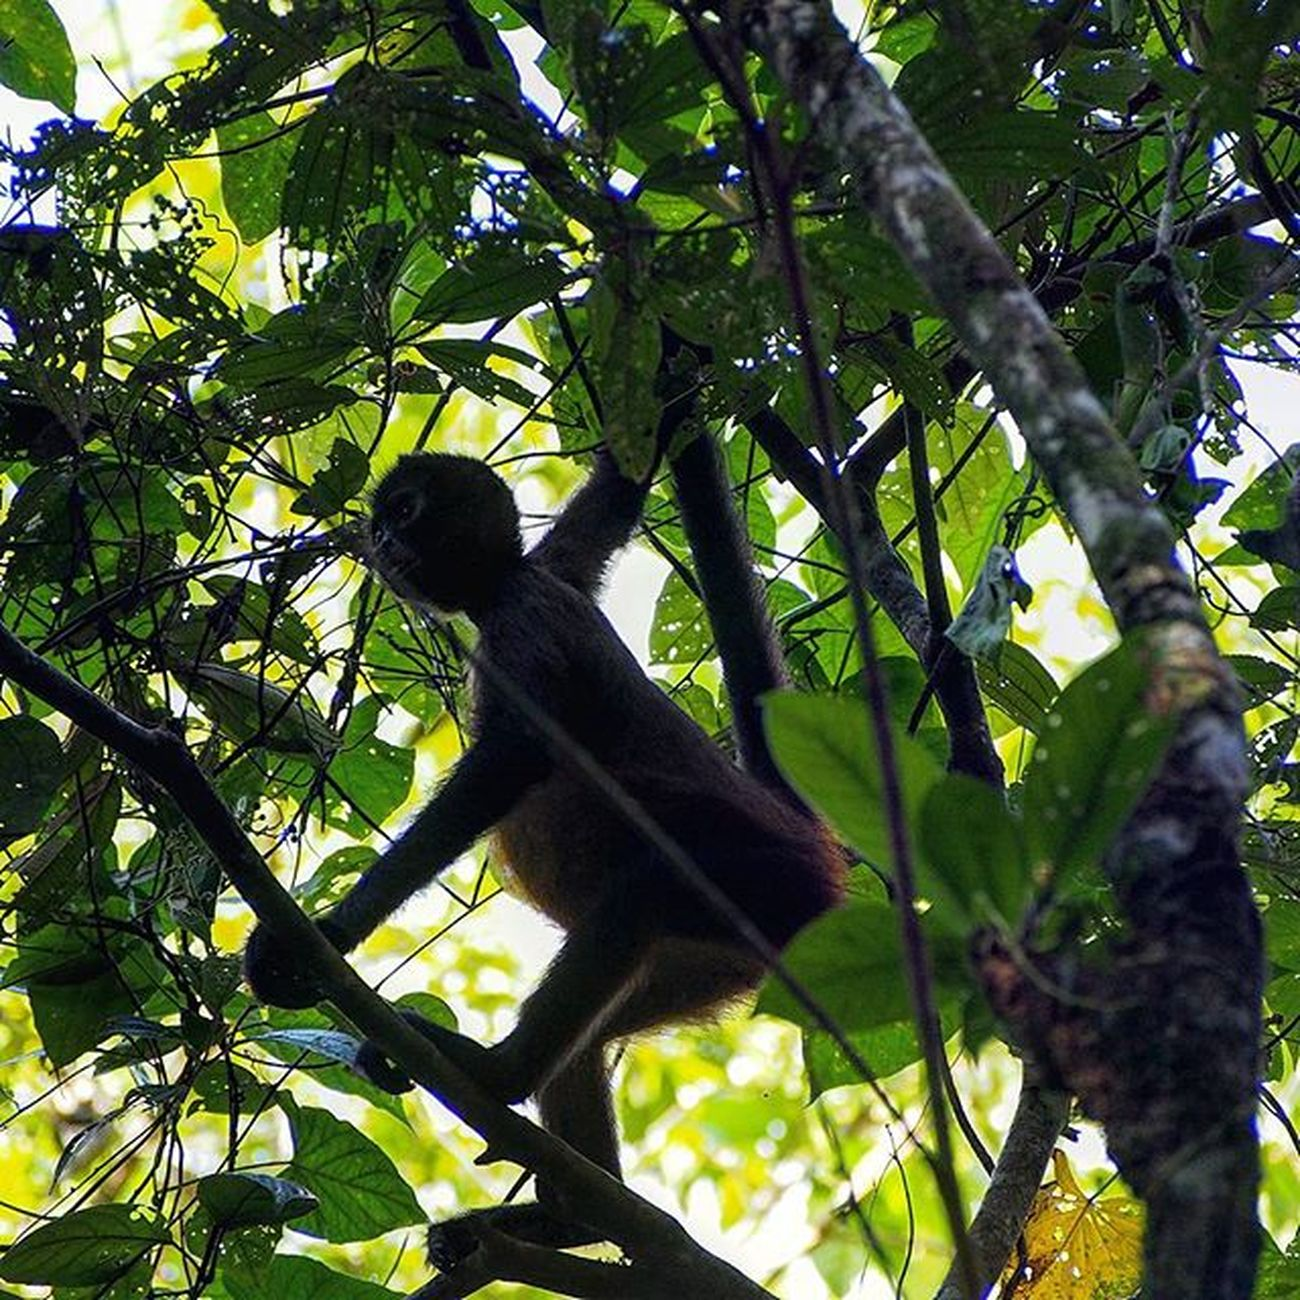 A howler monkey hanging around in a tree while we were on a nature walk in Tortugeuaro, Costa Rica _____________________________________ Howlermonkey Monkey Monkeyingaround Tortuguero  Tortugueronationalpark Wildlife_perfection Wildlifephotography Wild Wildlife Wildlife_seekers Naturephotography Naturelover Nature Naturelovers Costarica2015 Costaricagram Costarica Gadventures Travel Travelgram Instatravel Takemeback Olympus